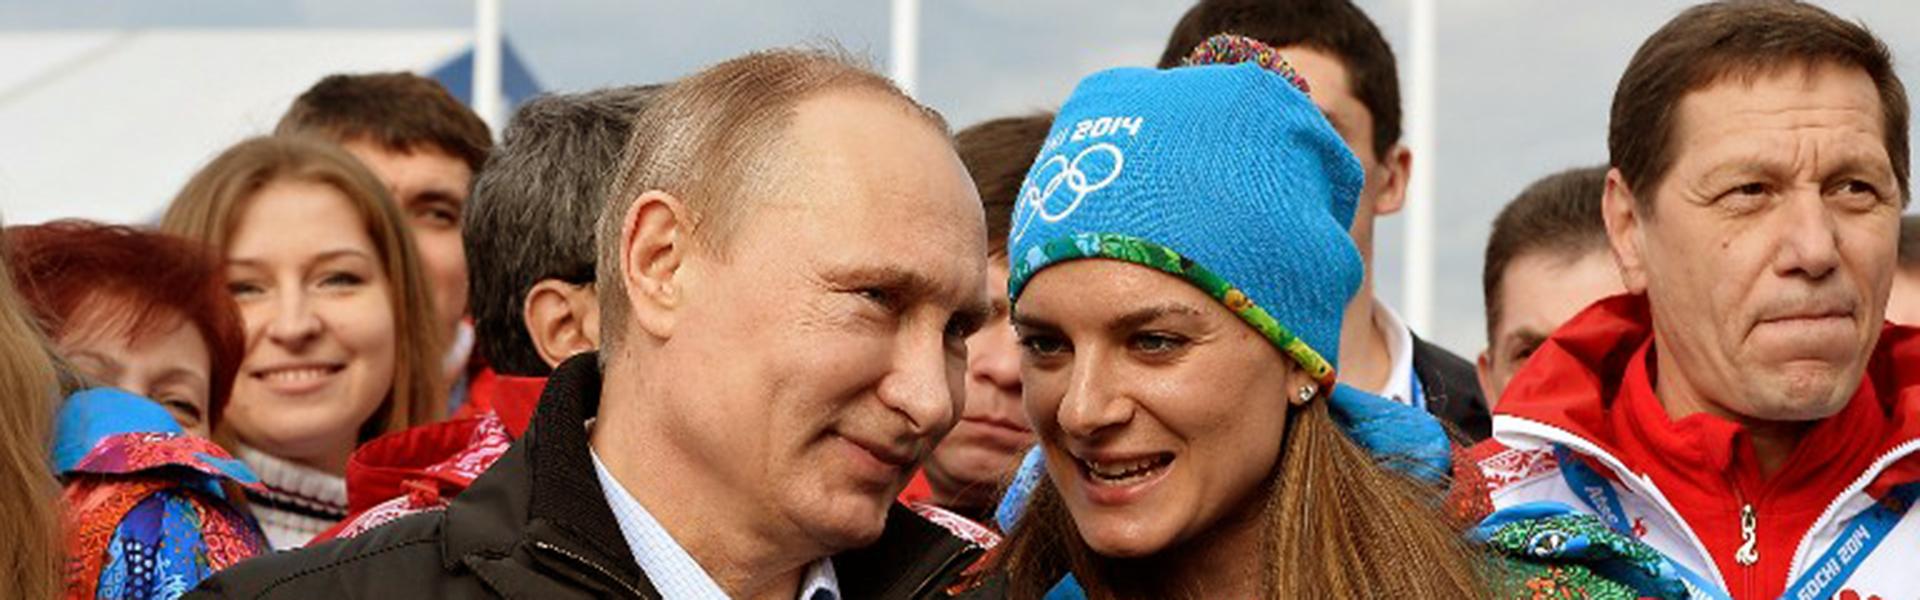 Патриотический допинг: не надо русским олимпиад